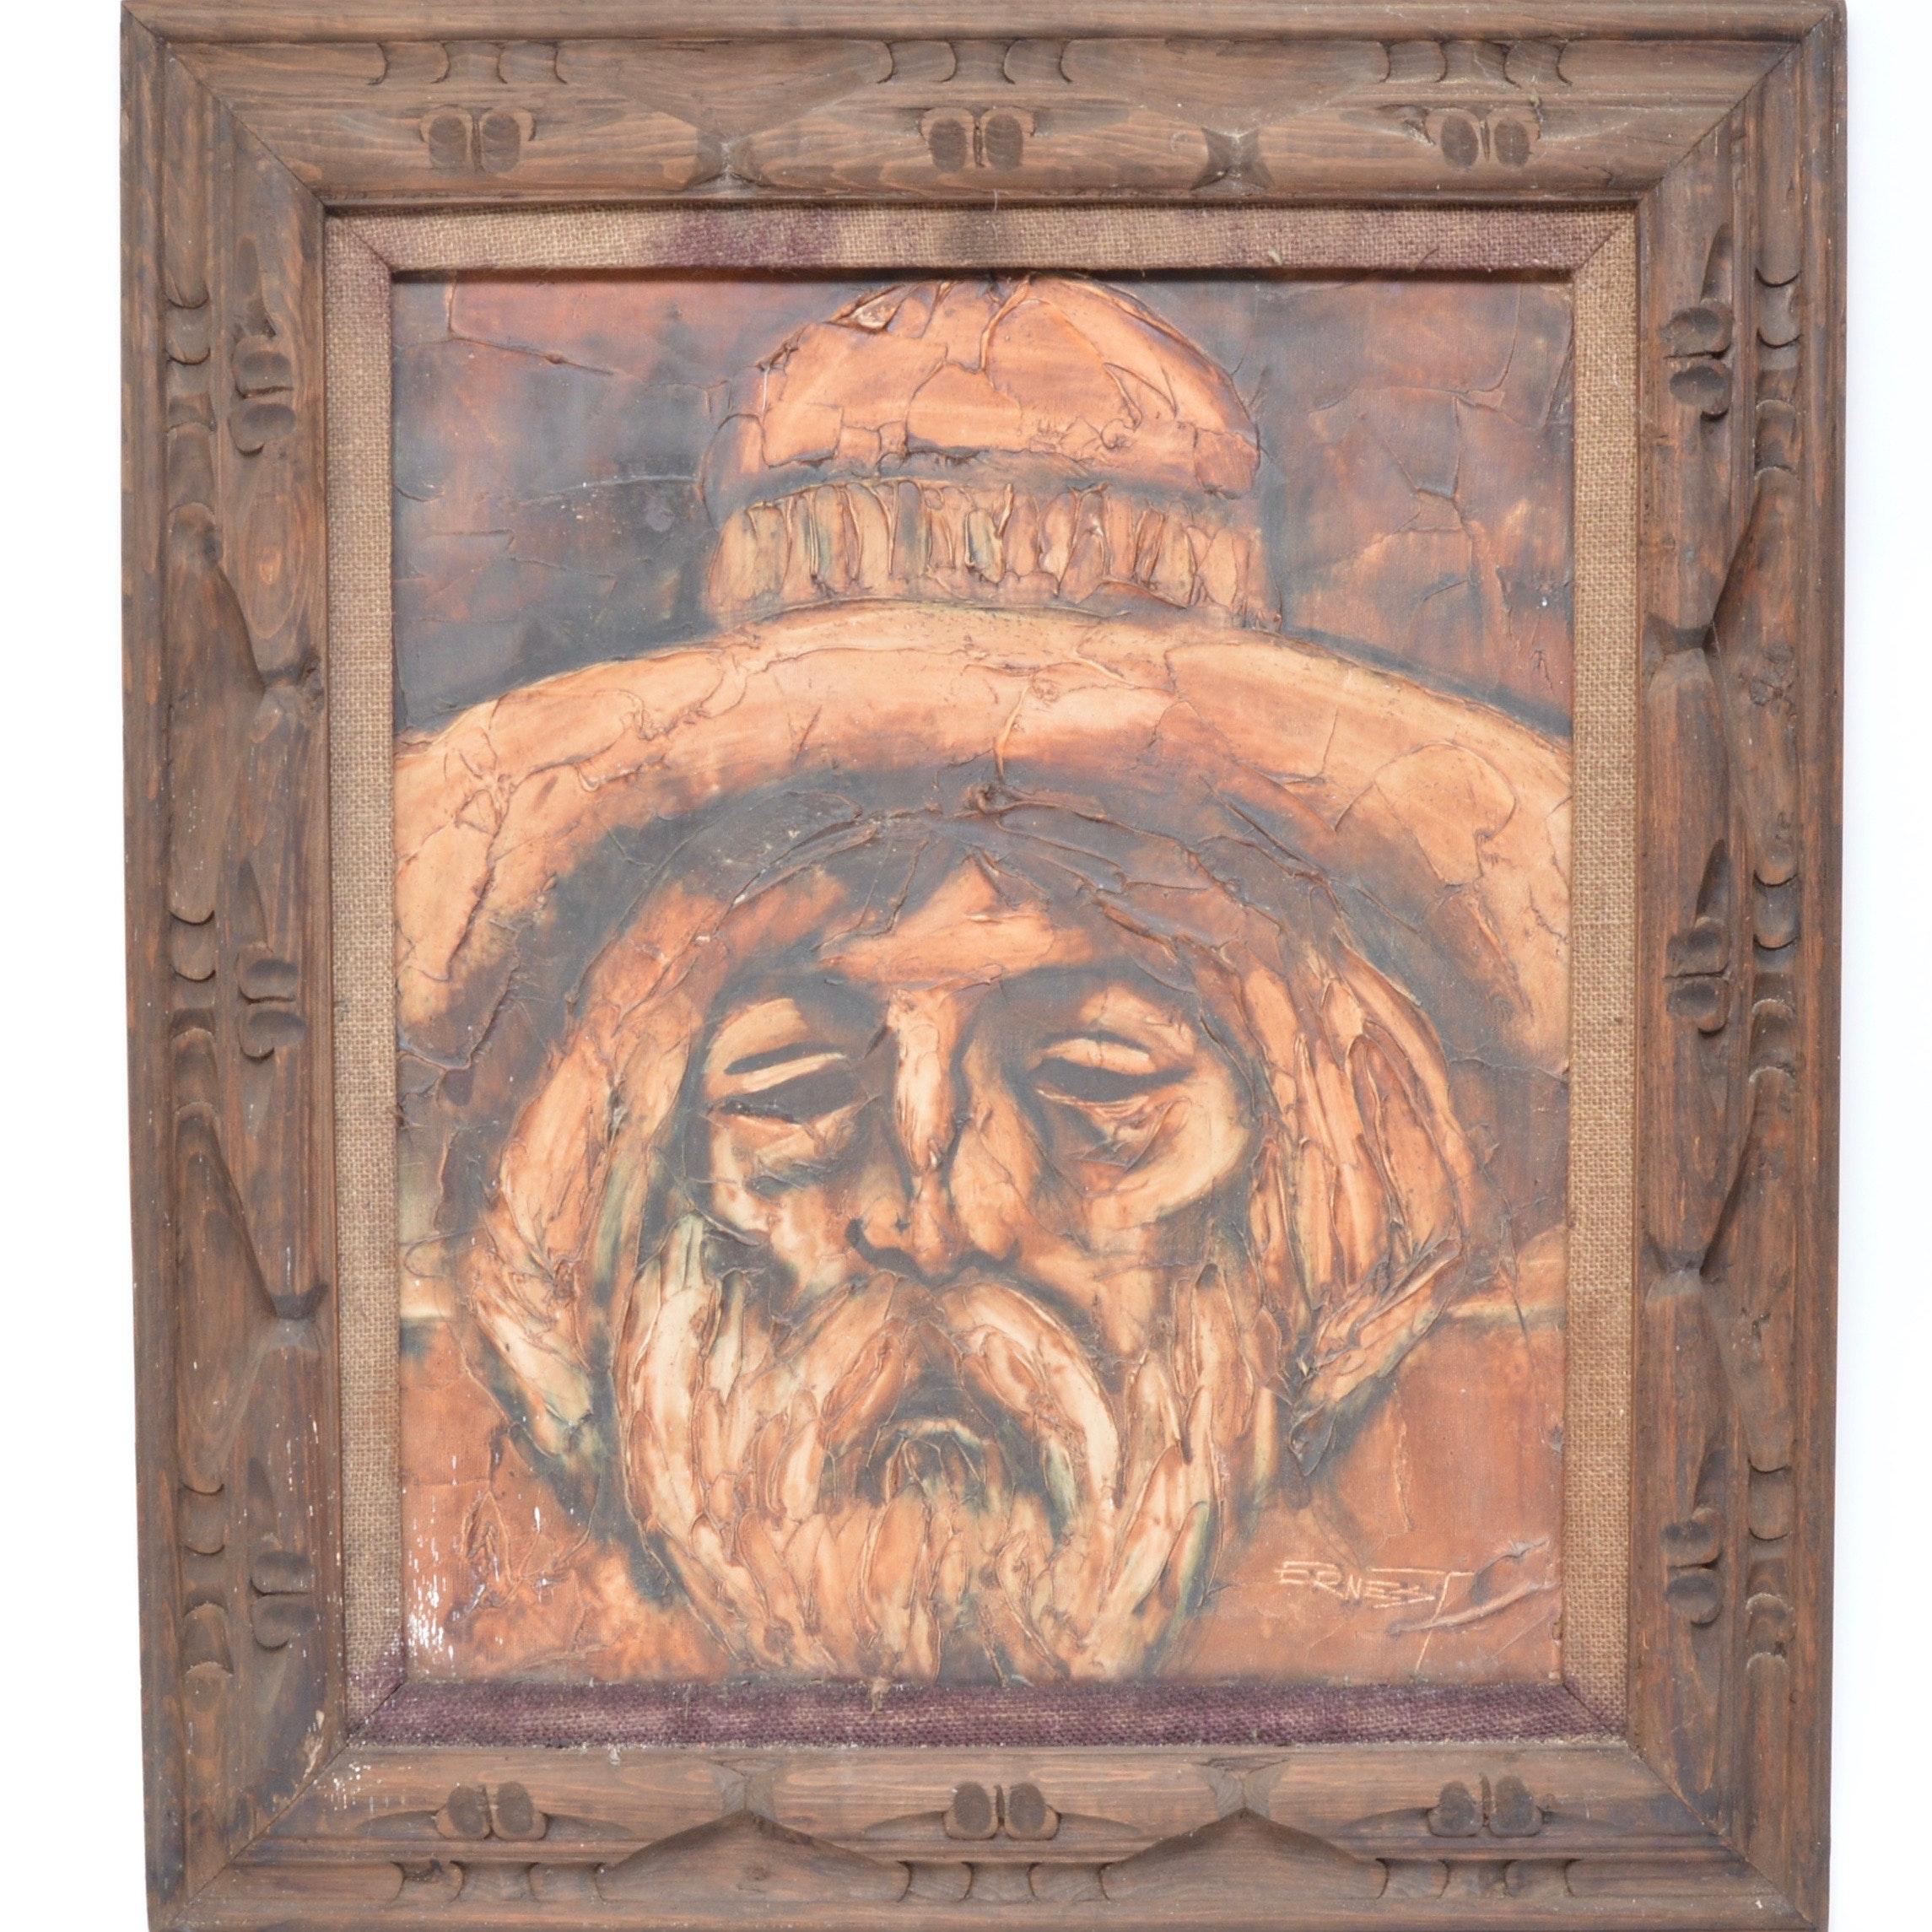 Vintage Impasto Oil Painting in Carved Wood Frame